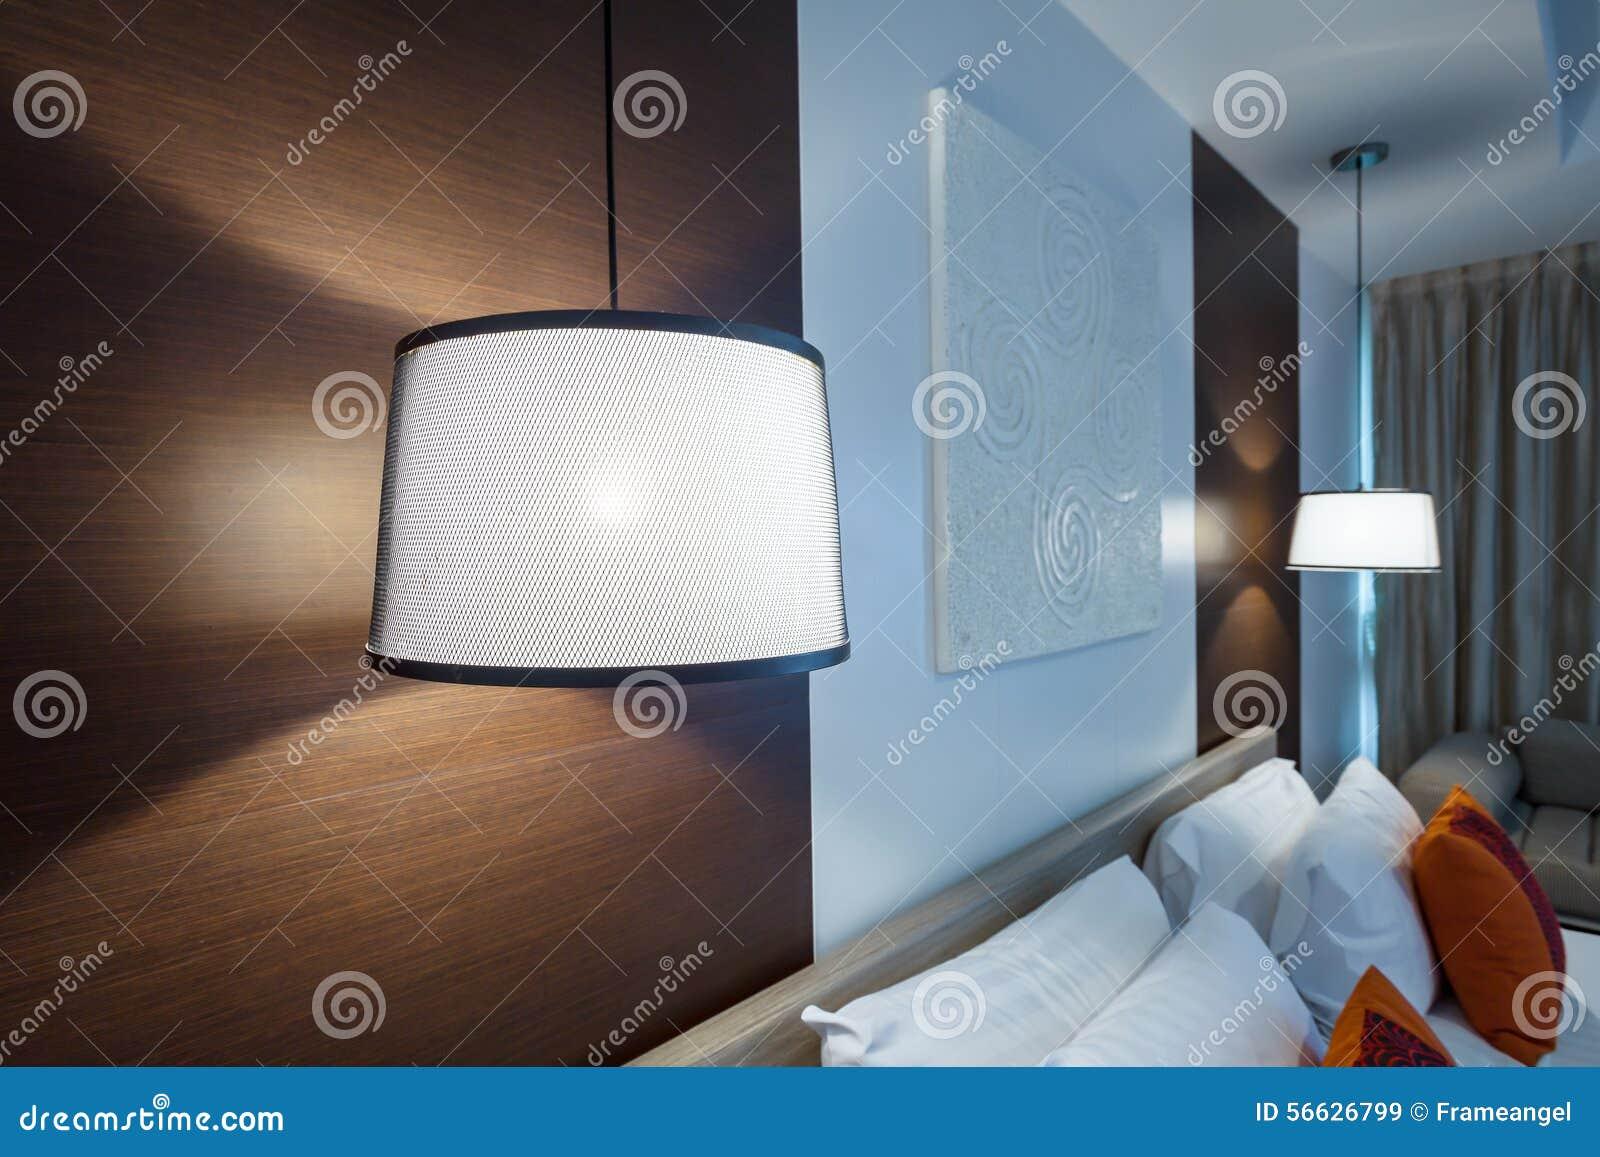 Slaapkamer Lampen Plafond: Slaapkamer lamp plafond ideas for licht ...